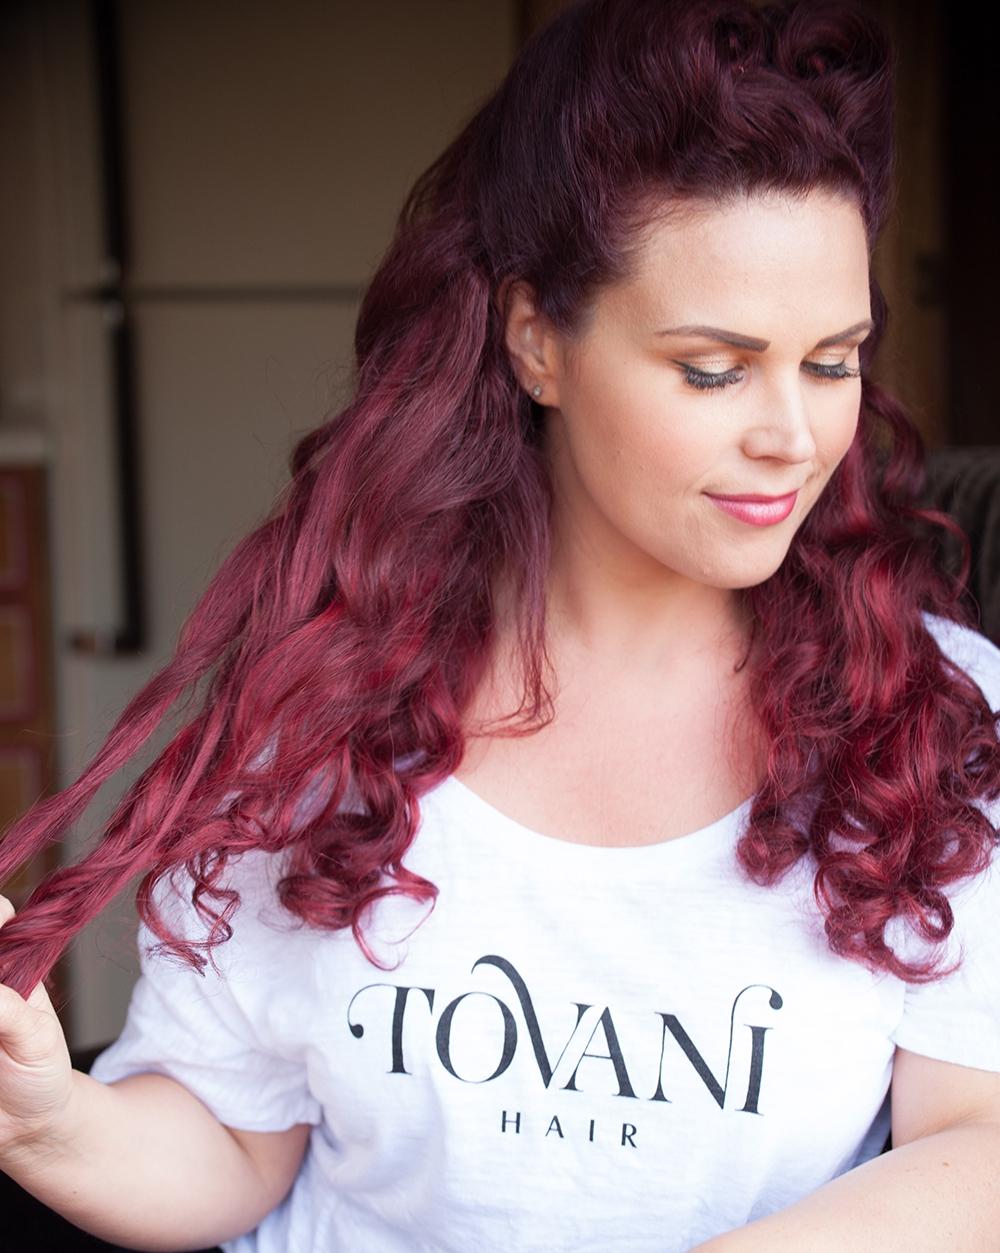 tovani-hair-color2.jpg